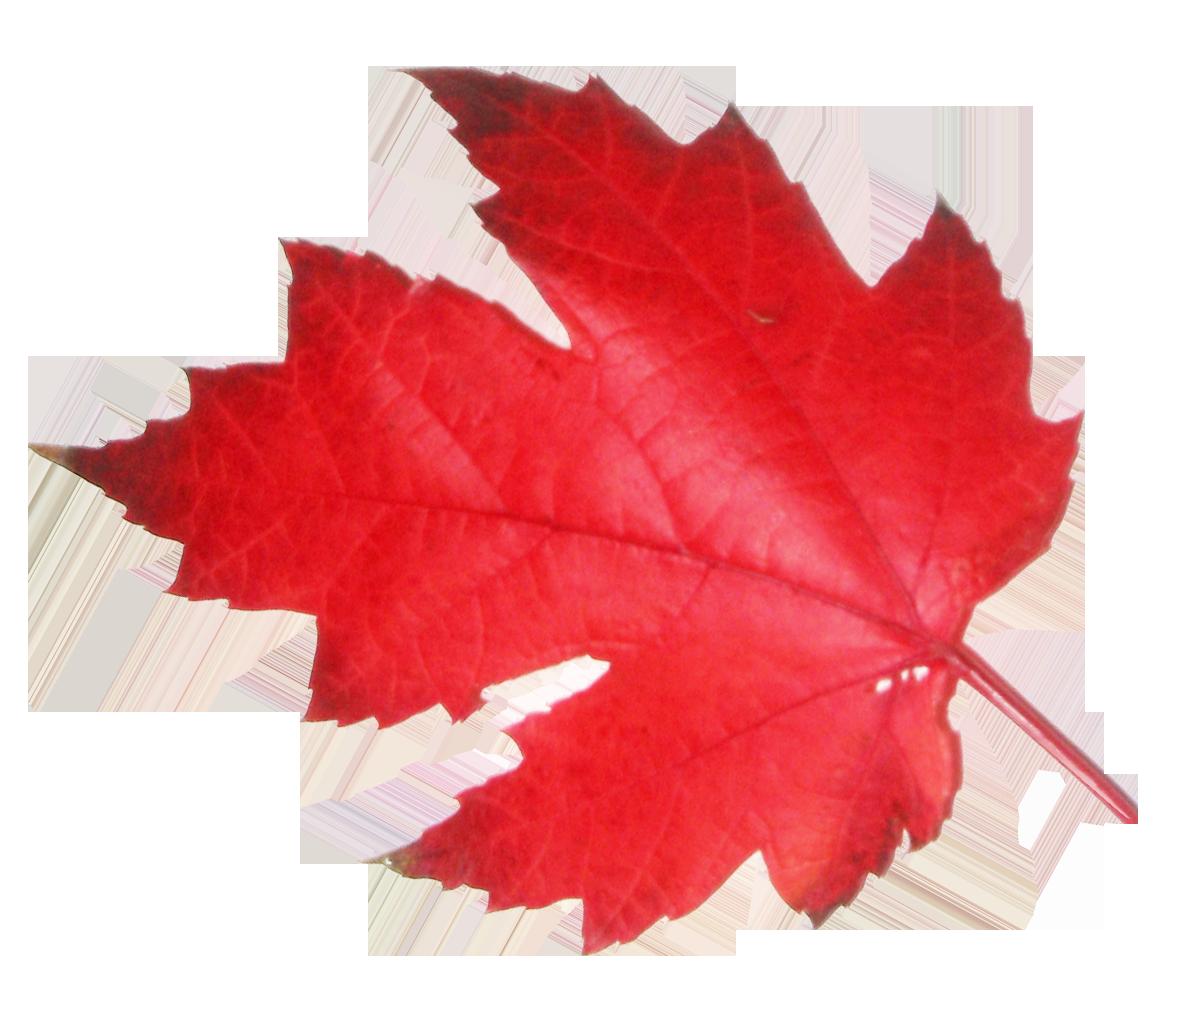 Maple Leaf Png Image Png Images Image Red Leaves